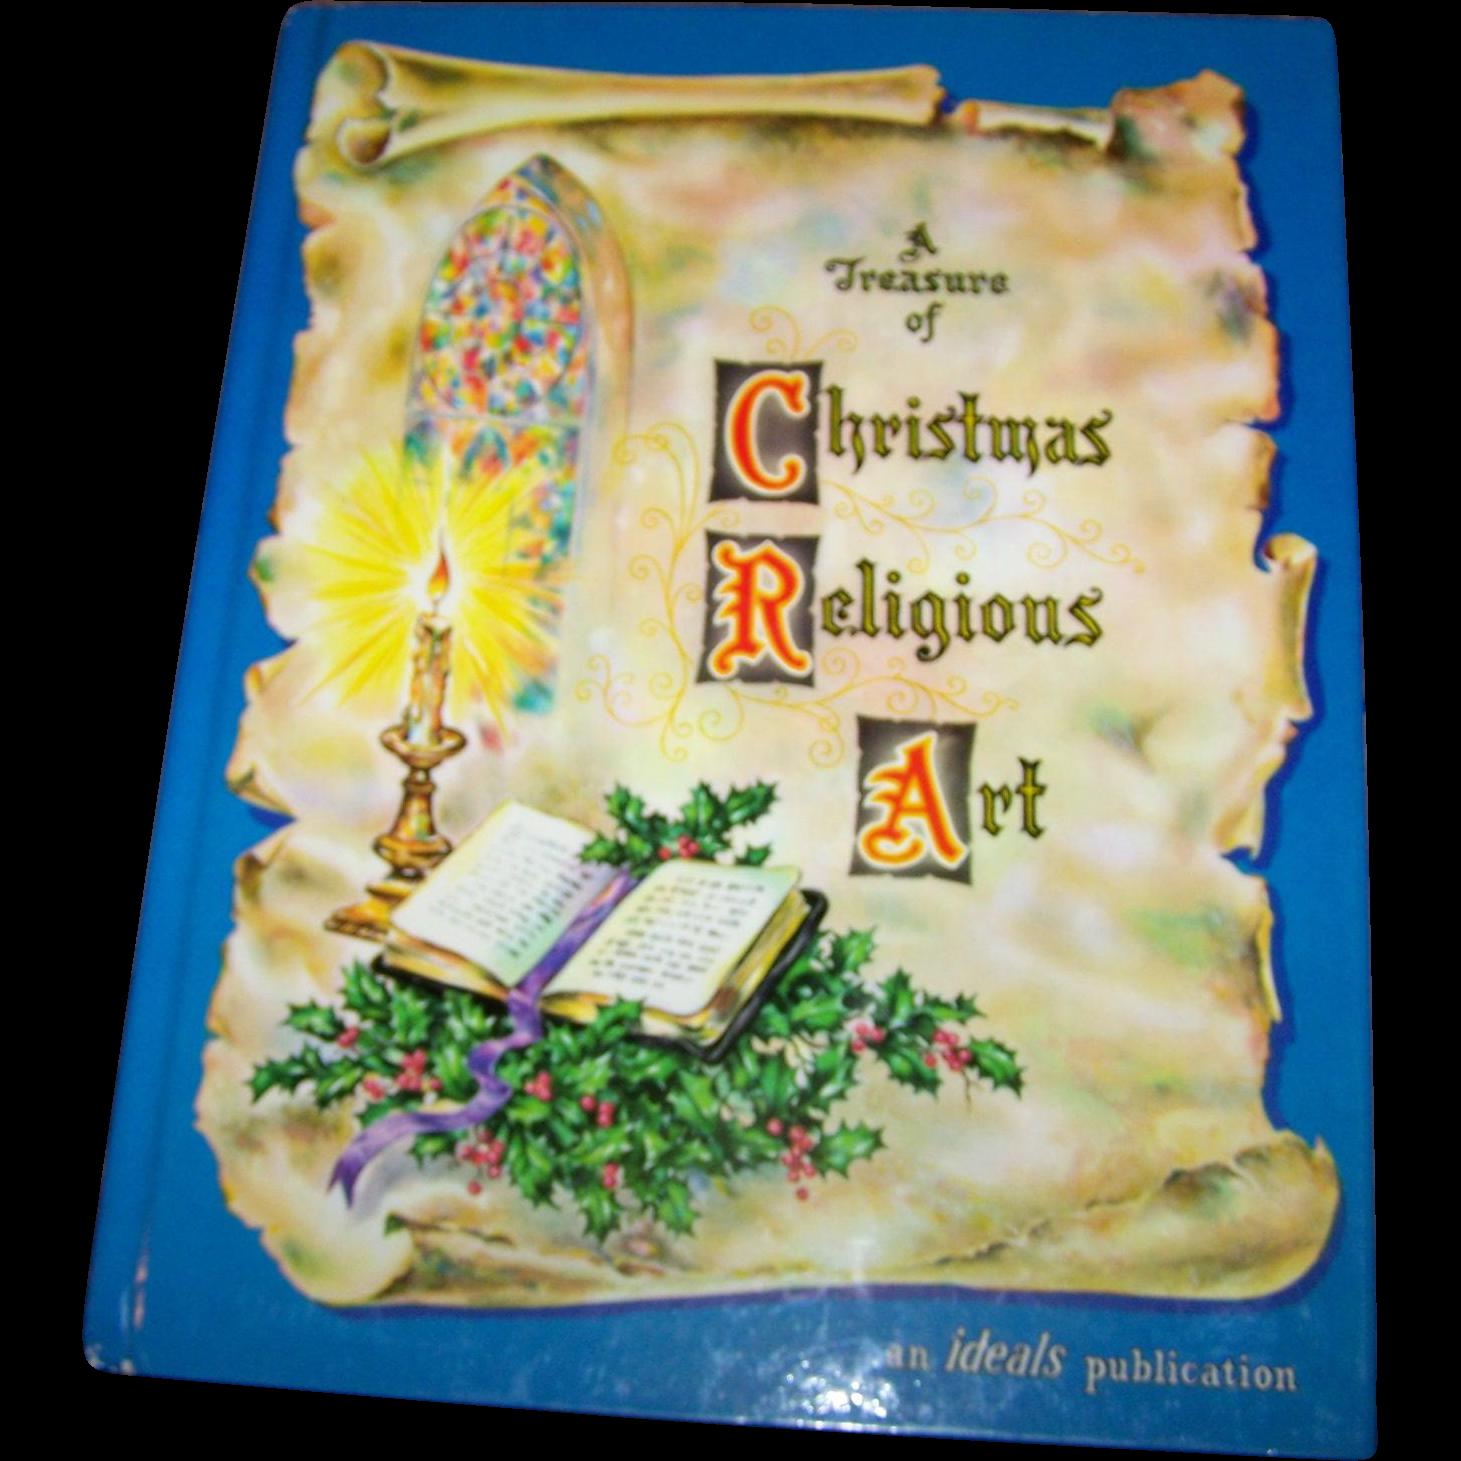 Vintge Hard Cover Book A Treasure of Christmas Religious Art an Ideals Publication